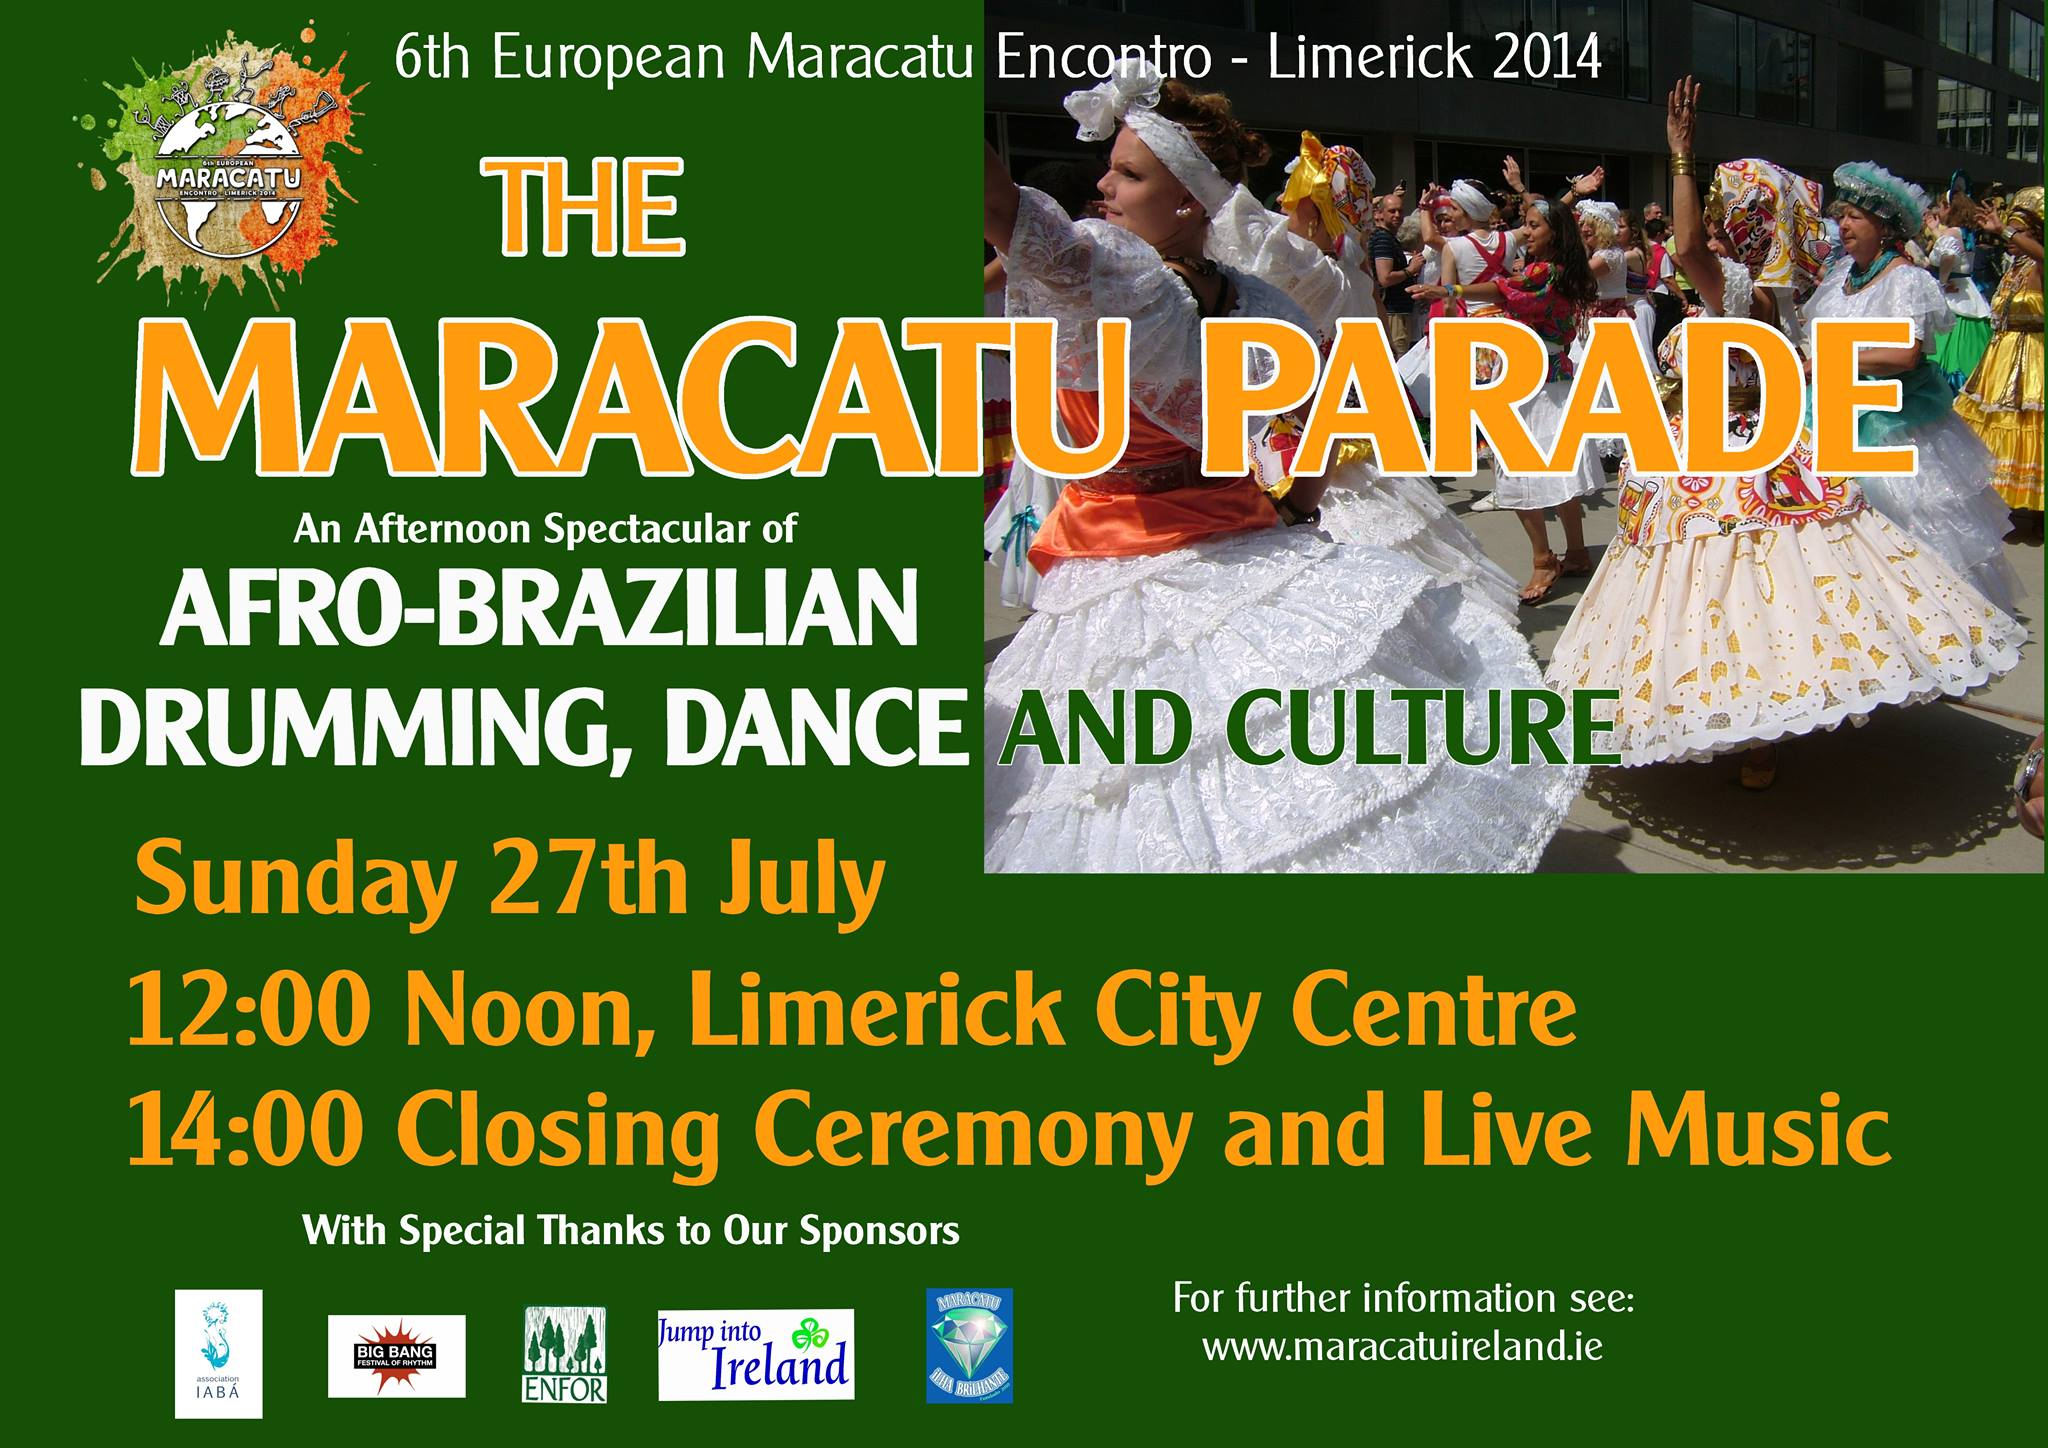 6th European Encontro of Maracatu